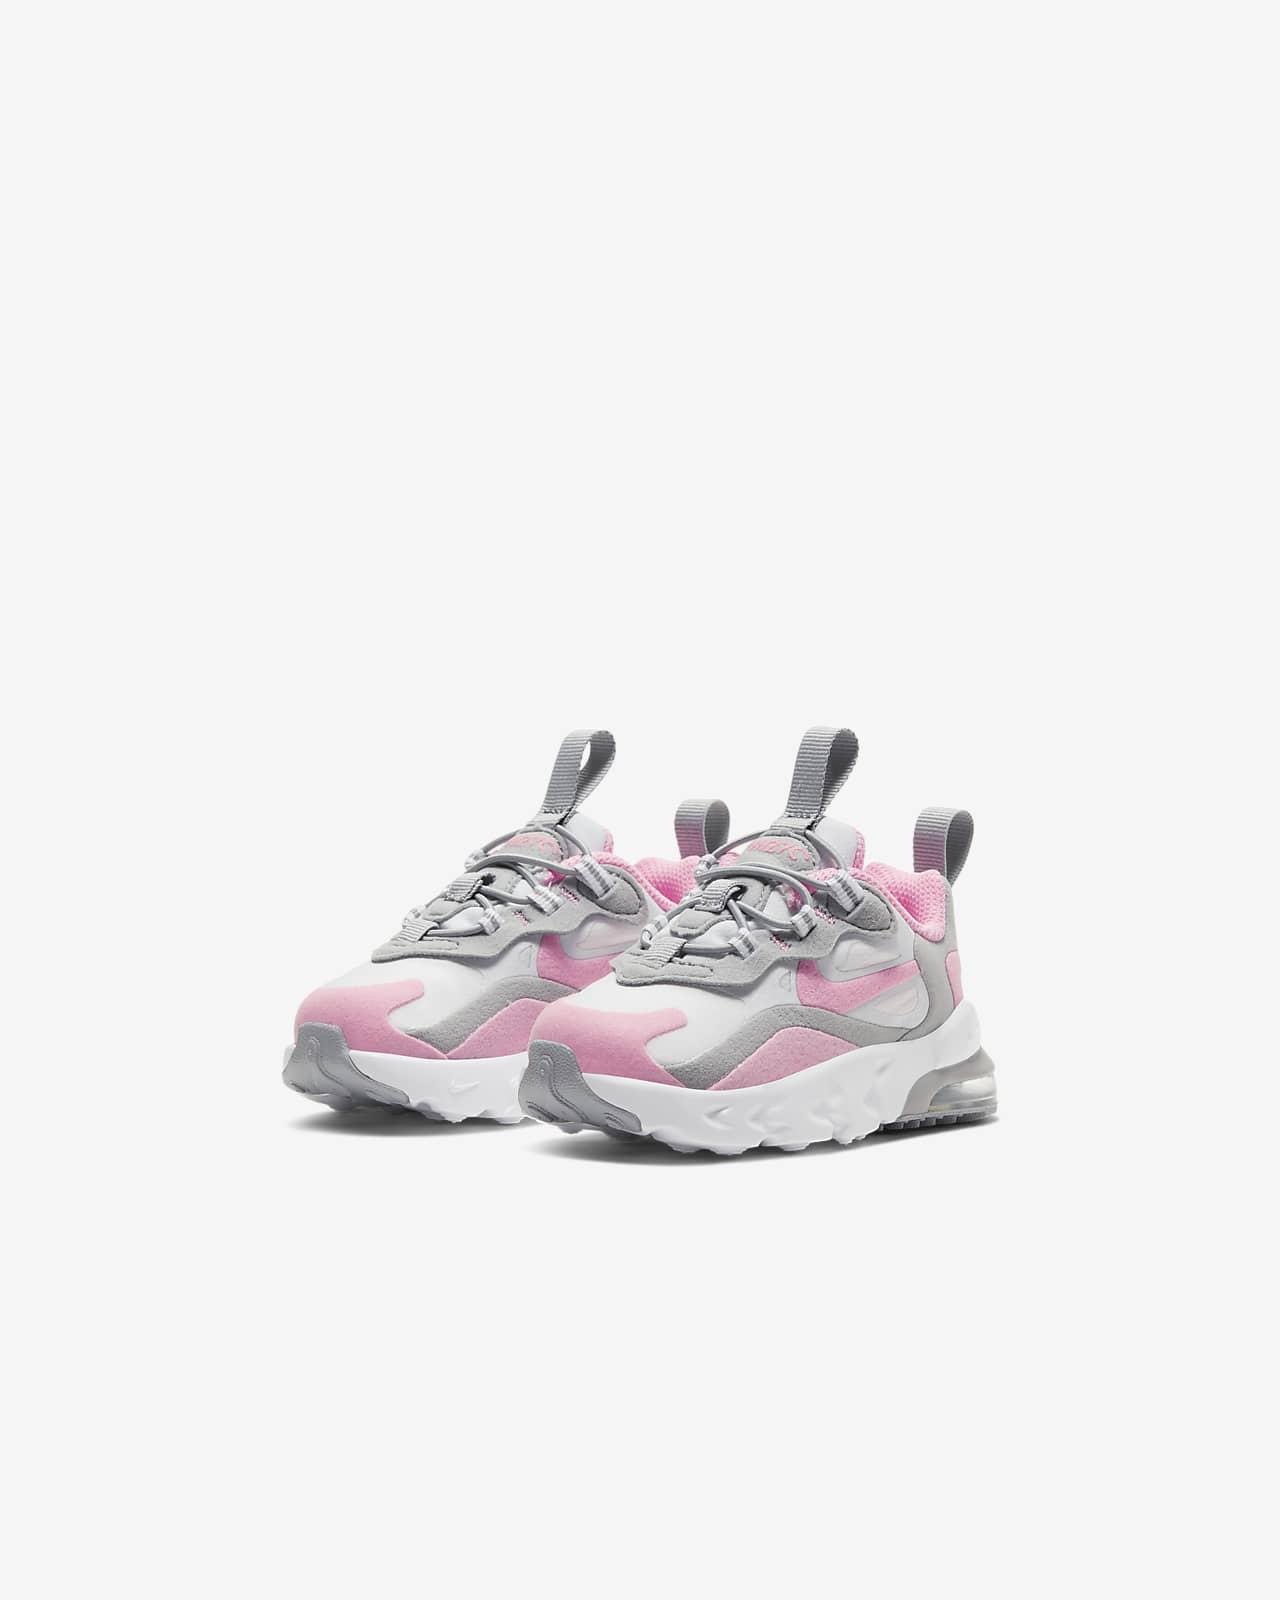 pelo Quagga Orgulloso  Nike Air Max 270 RT Baby &Toddler Shoe. Nike NO